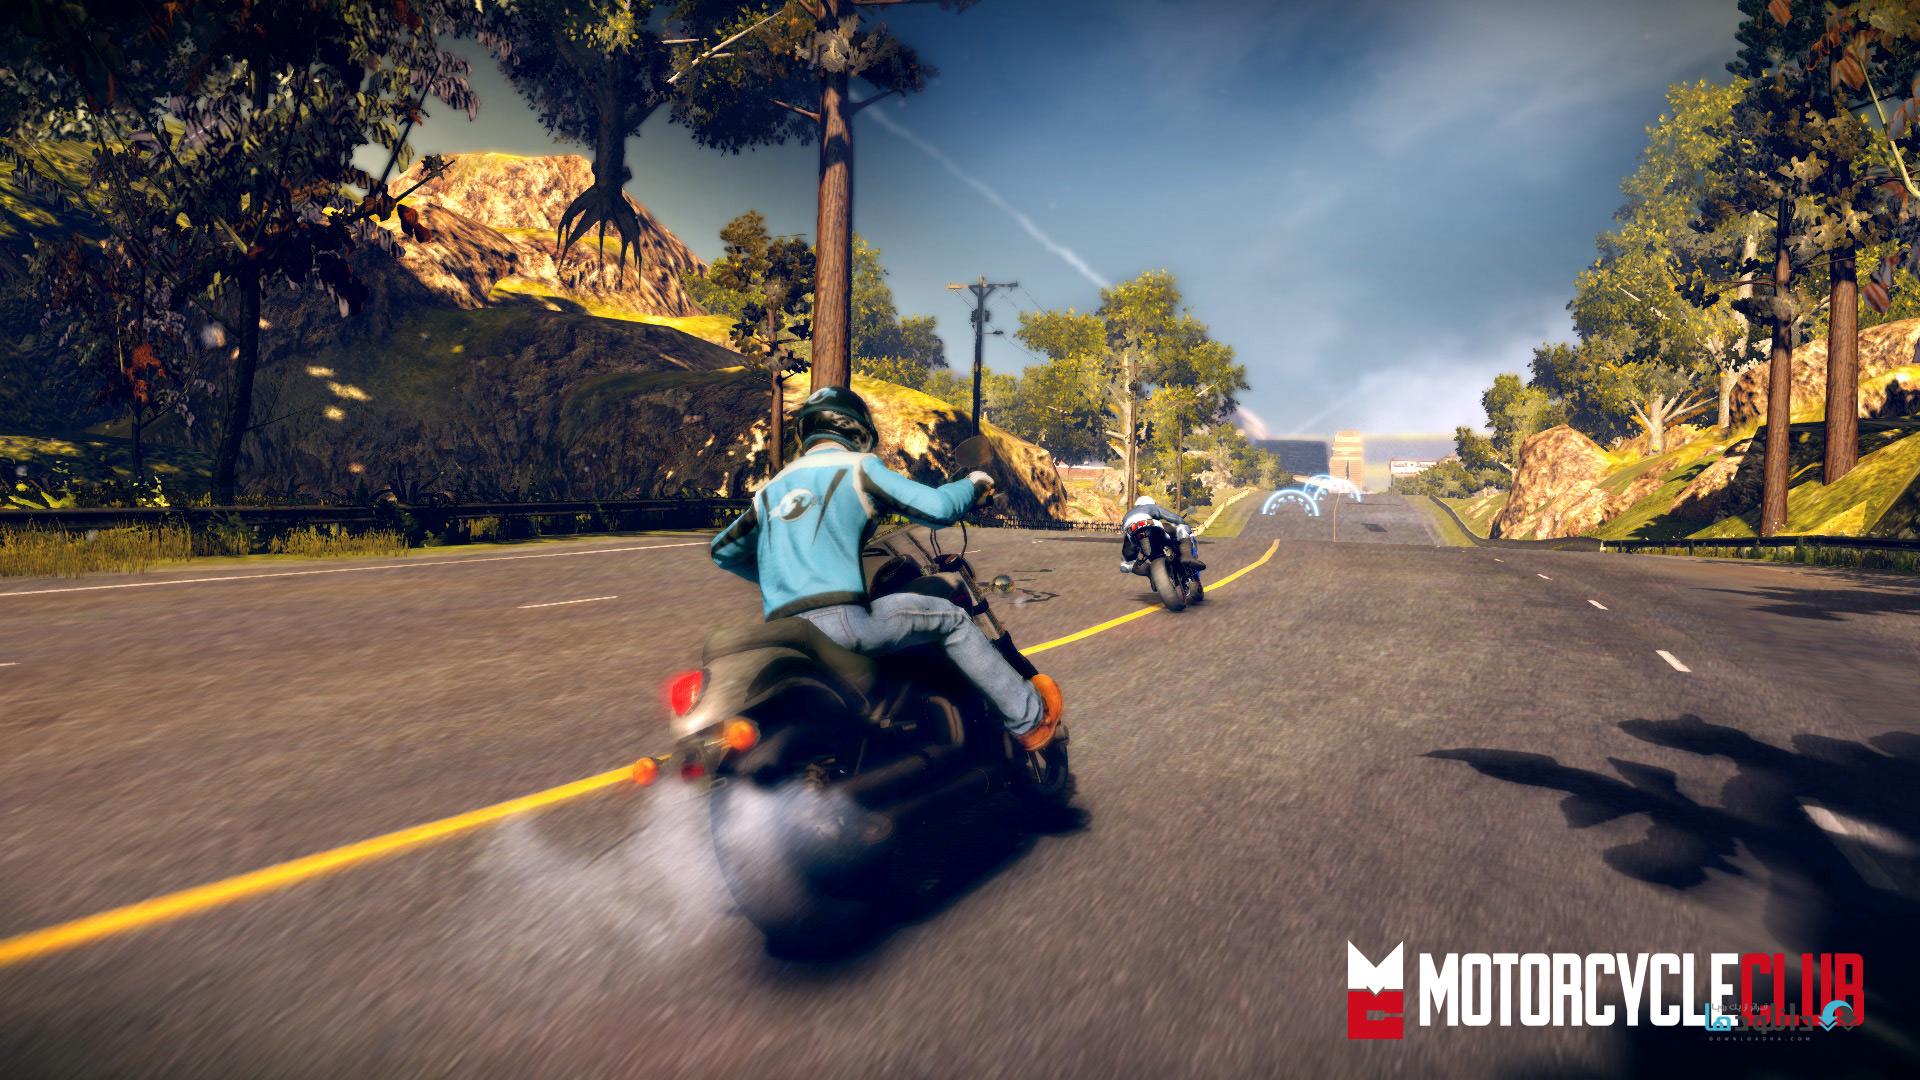 http://img5.downloadha.com/hosein/Game/November%202014/28/Motorcycle-Club-screenshots-02-large.jpg